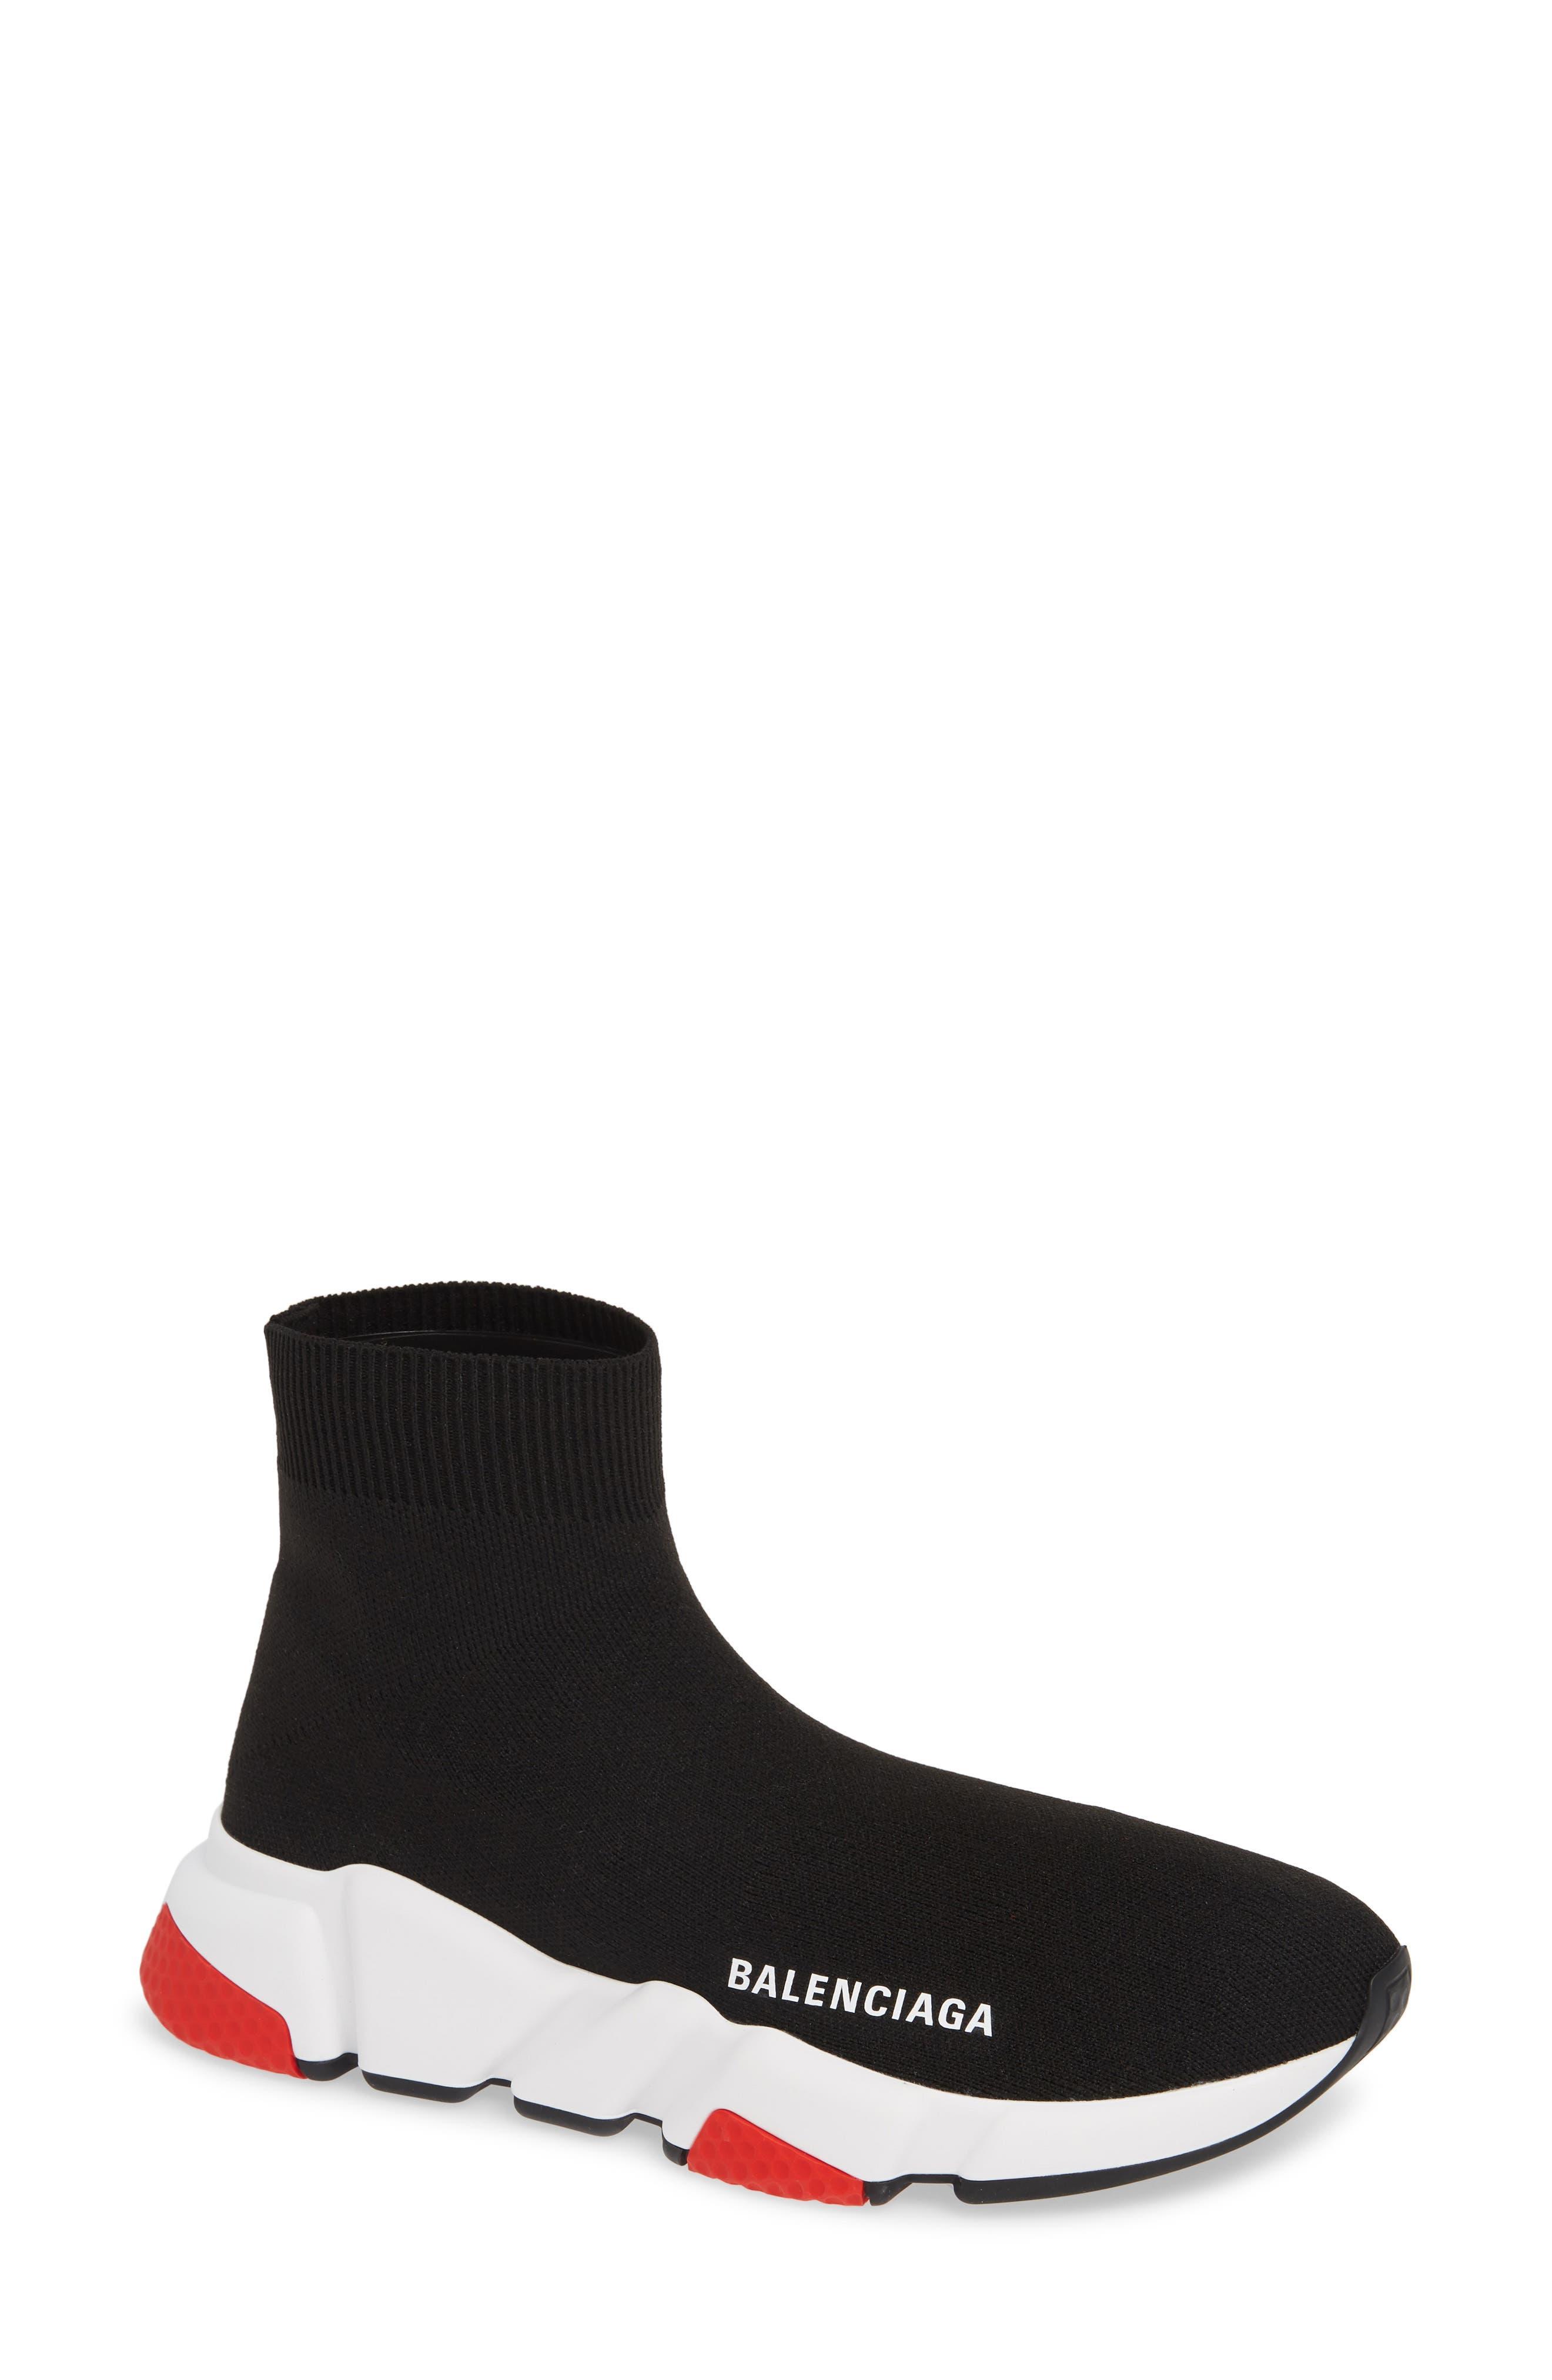 BALENCIAGA, Speed Knit Sneaker, Main thumbnail 1, color, BLACK/ RED